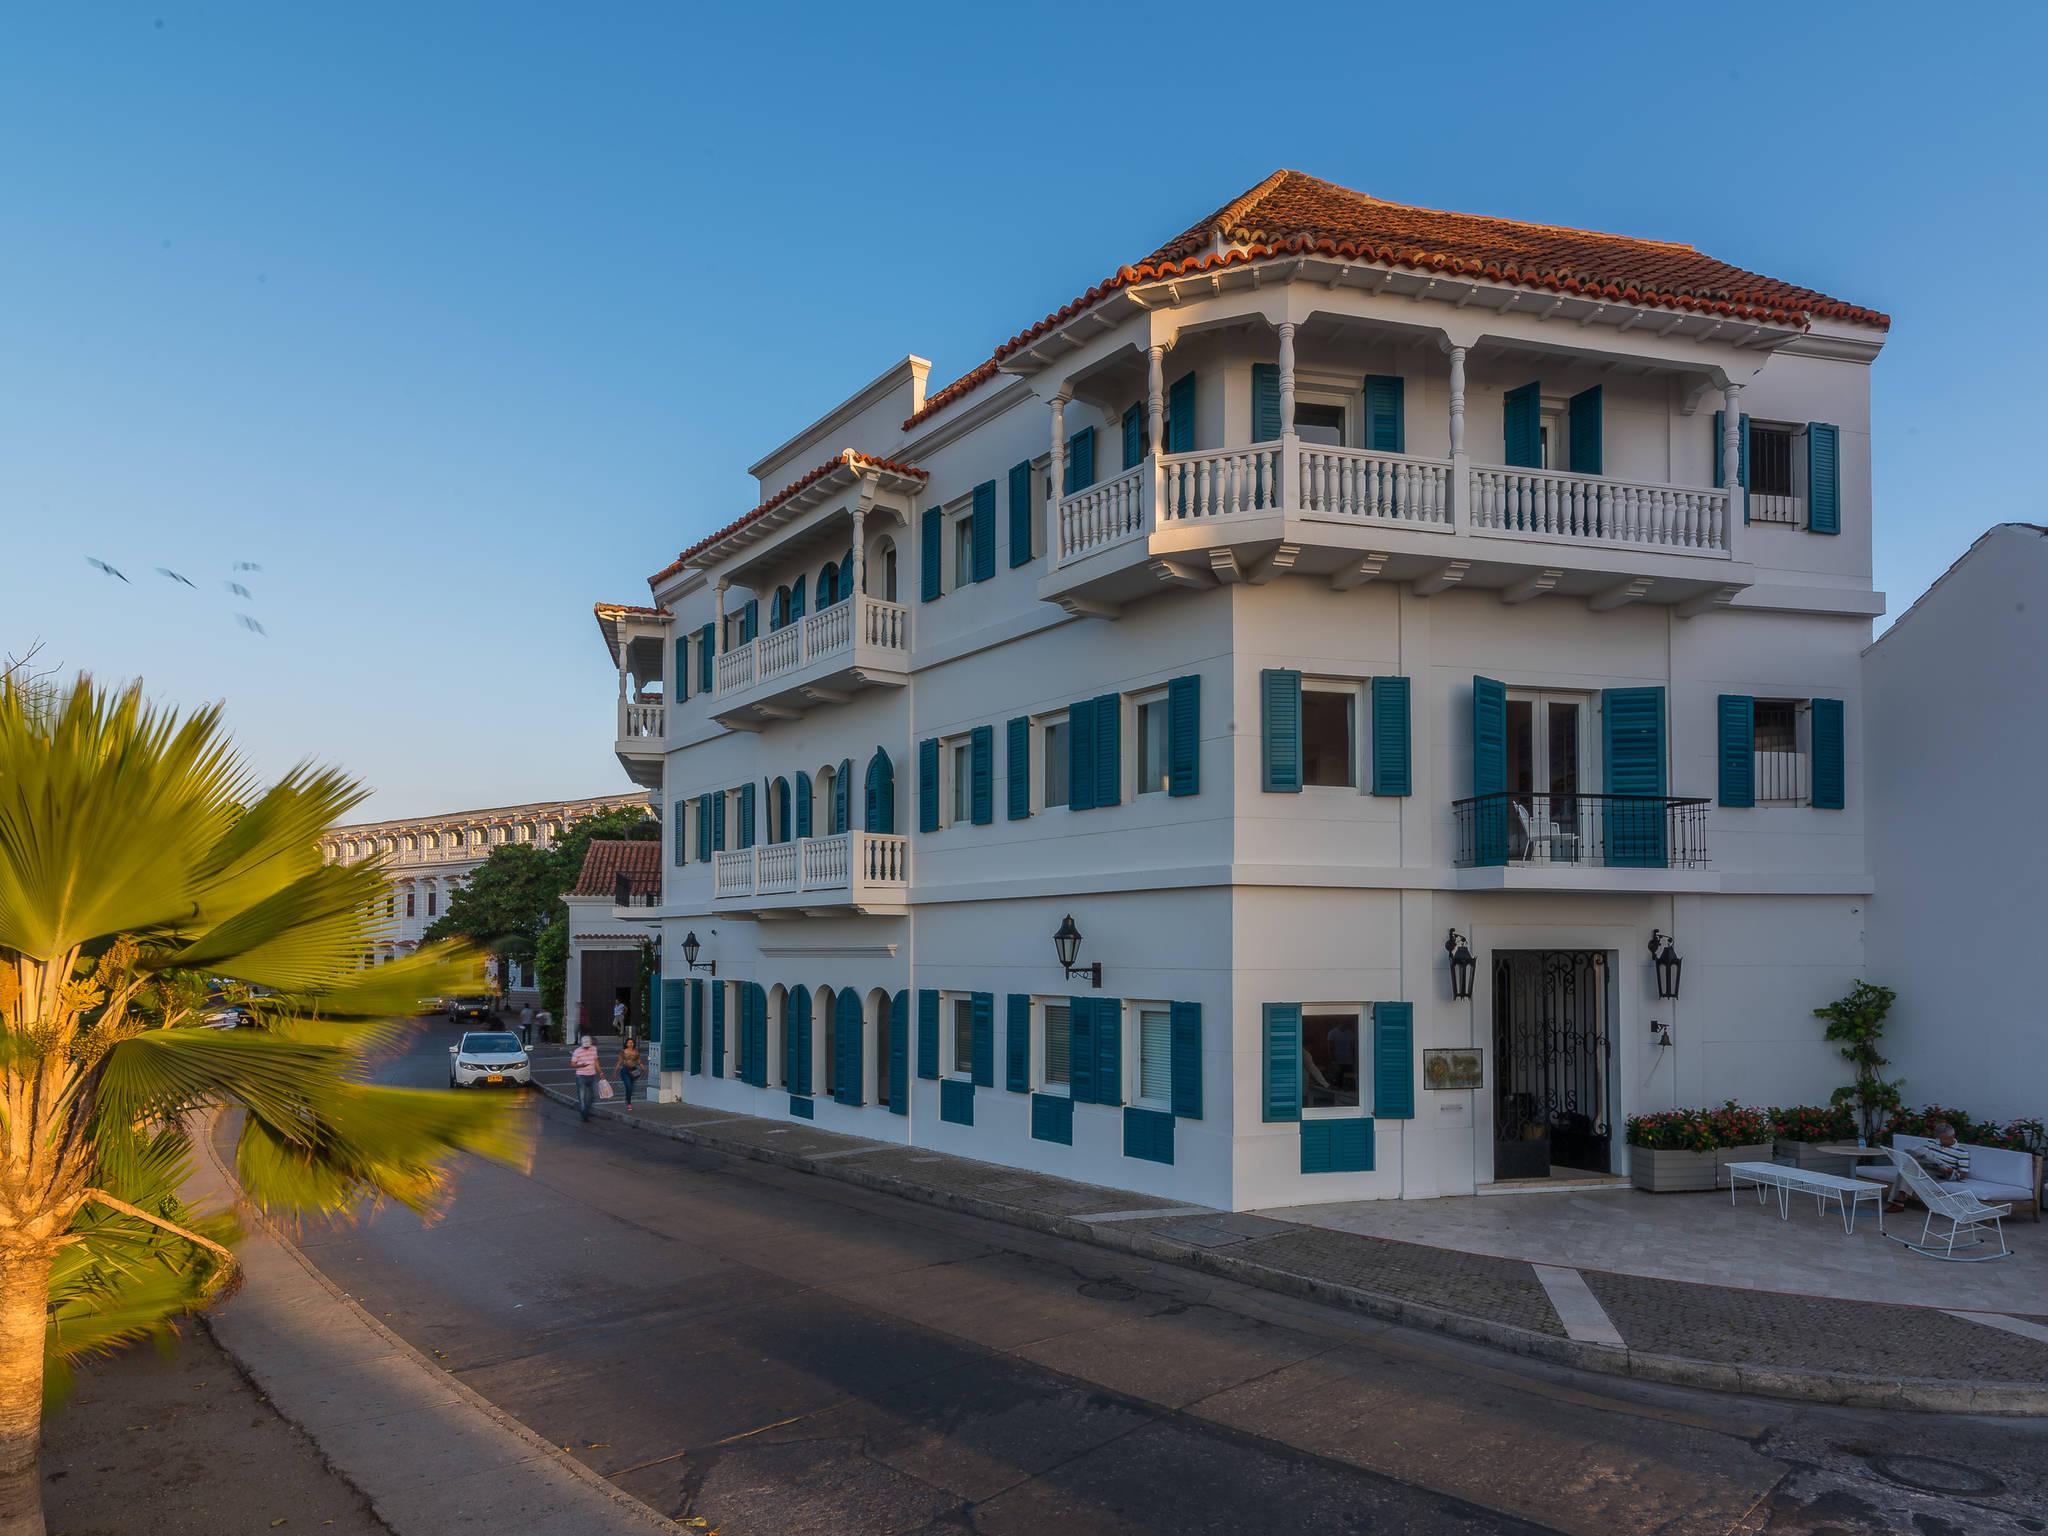 Hotell – Hotel Boutique Bovedas de Santa Clara